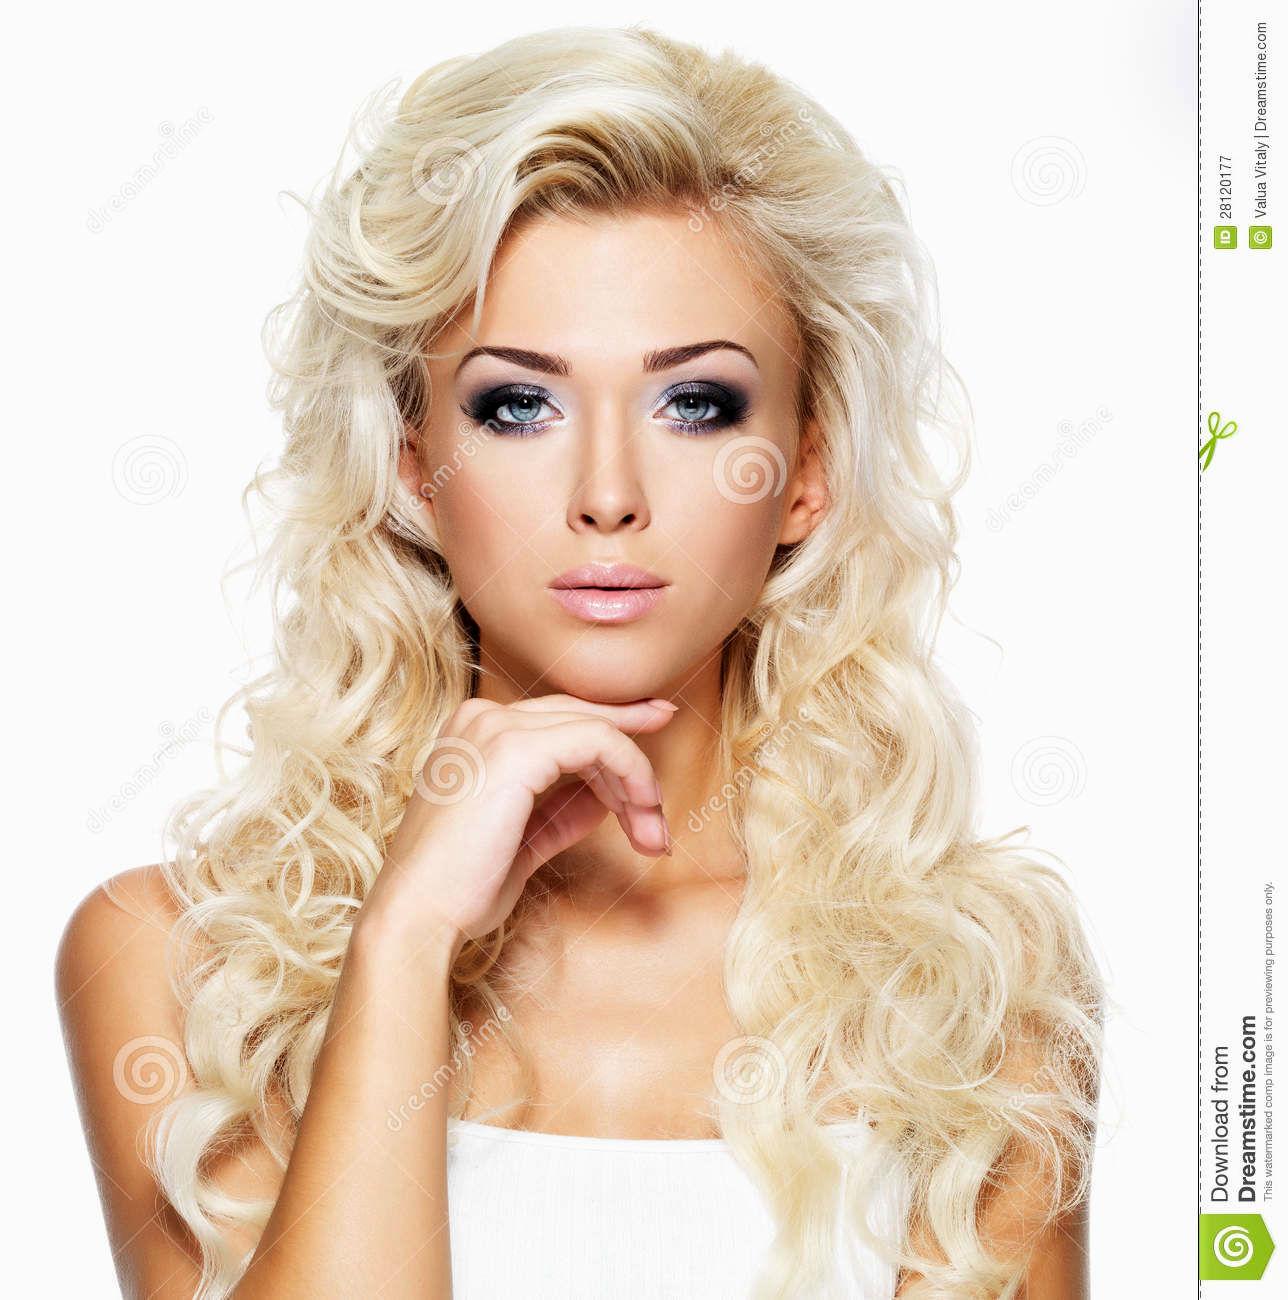 beautiful modelos de cabelos curtos fotografia-Ótimo Modelos De Cabelos Curtos Conceito